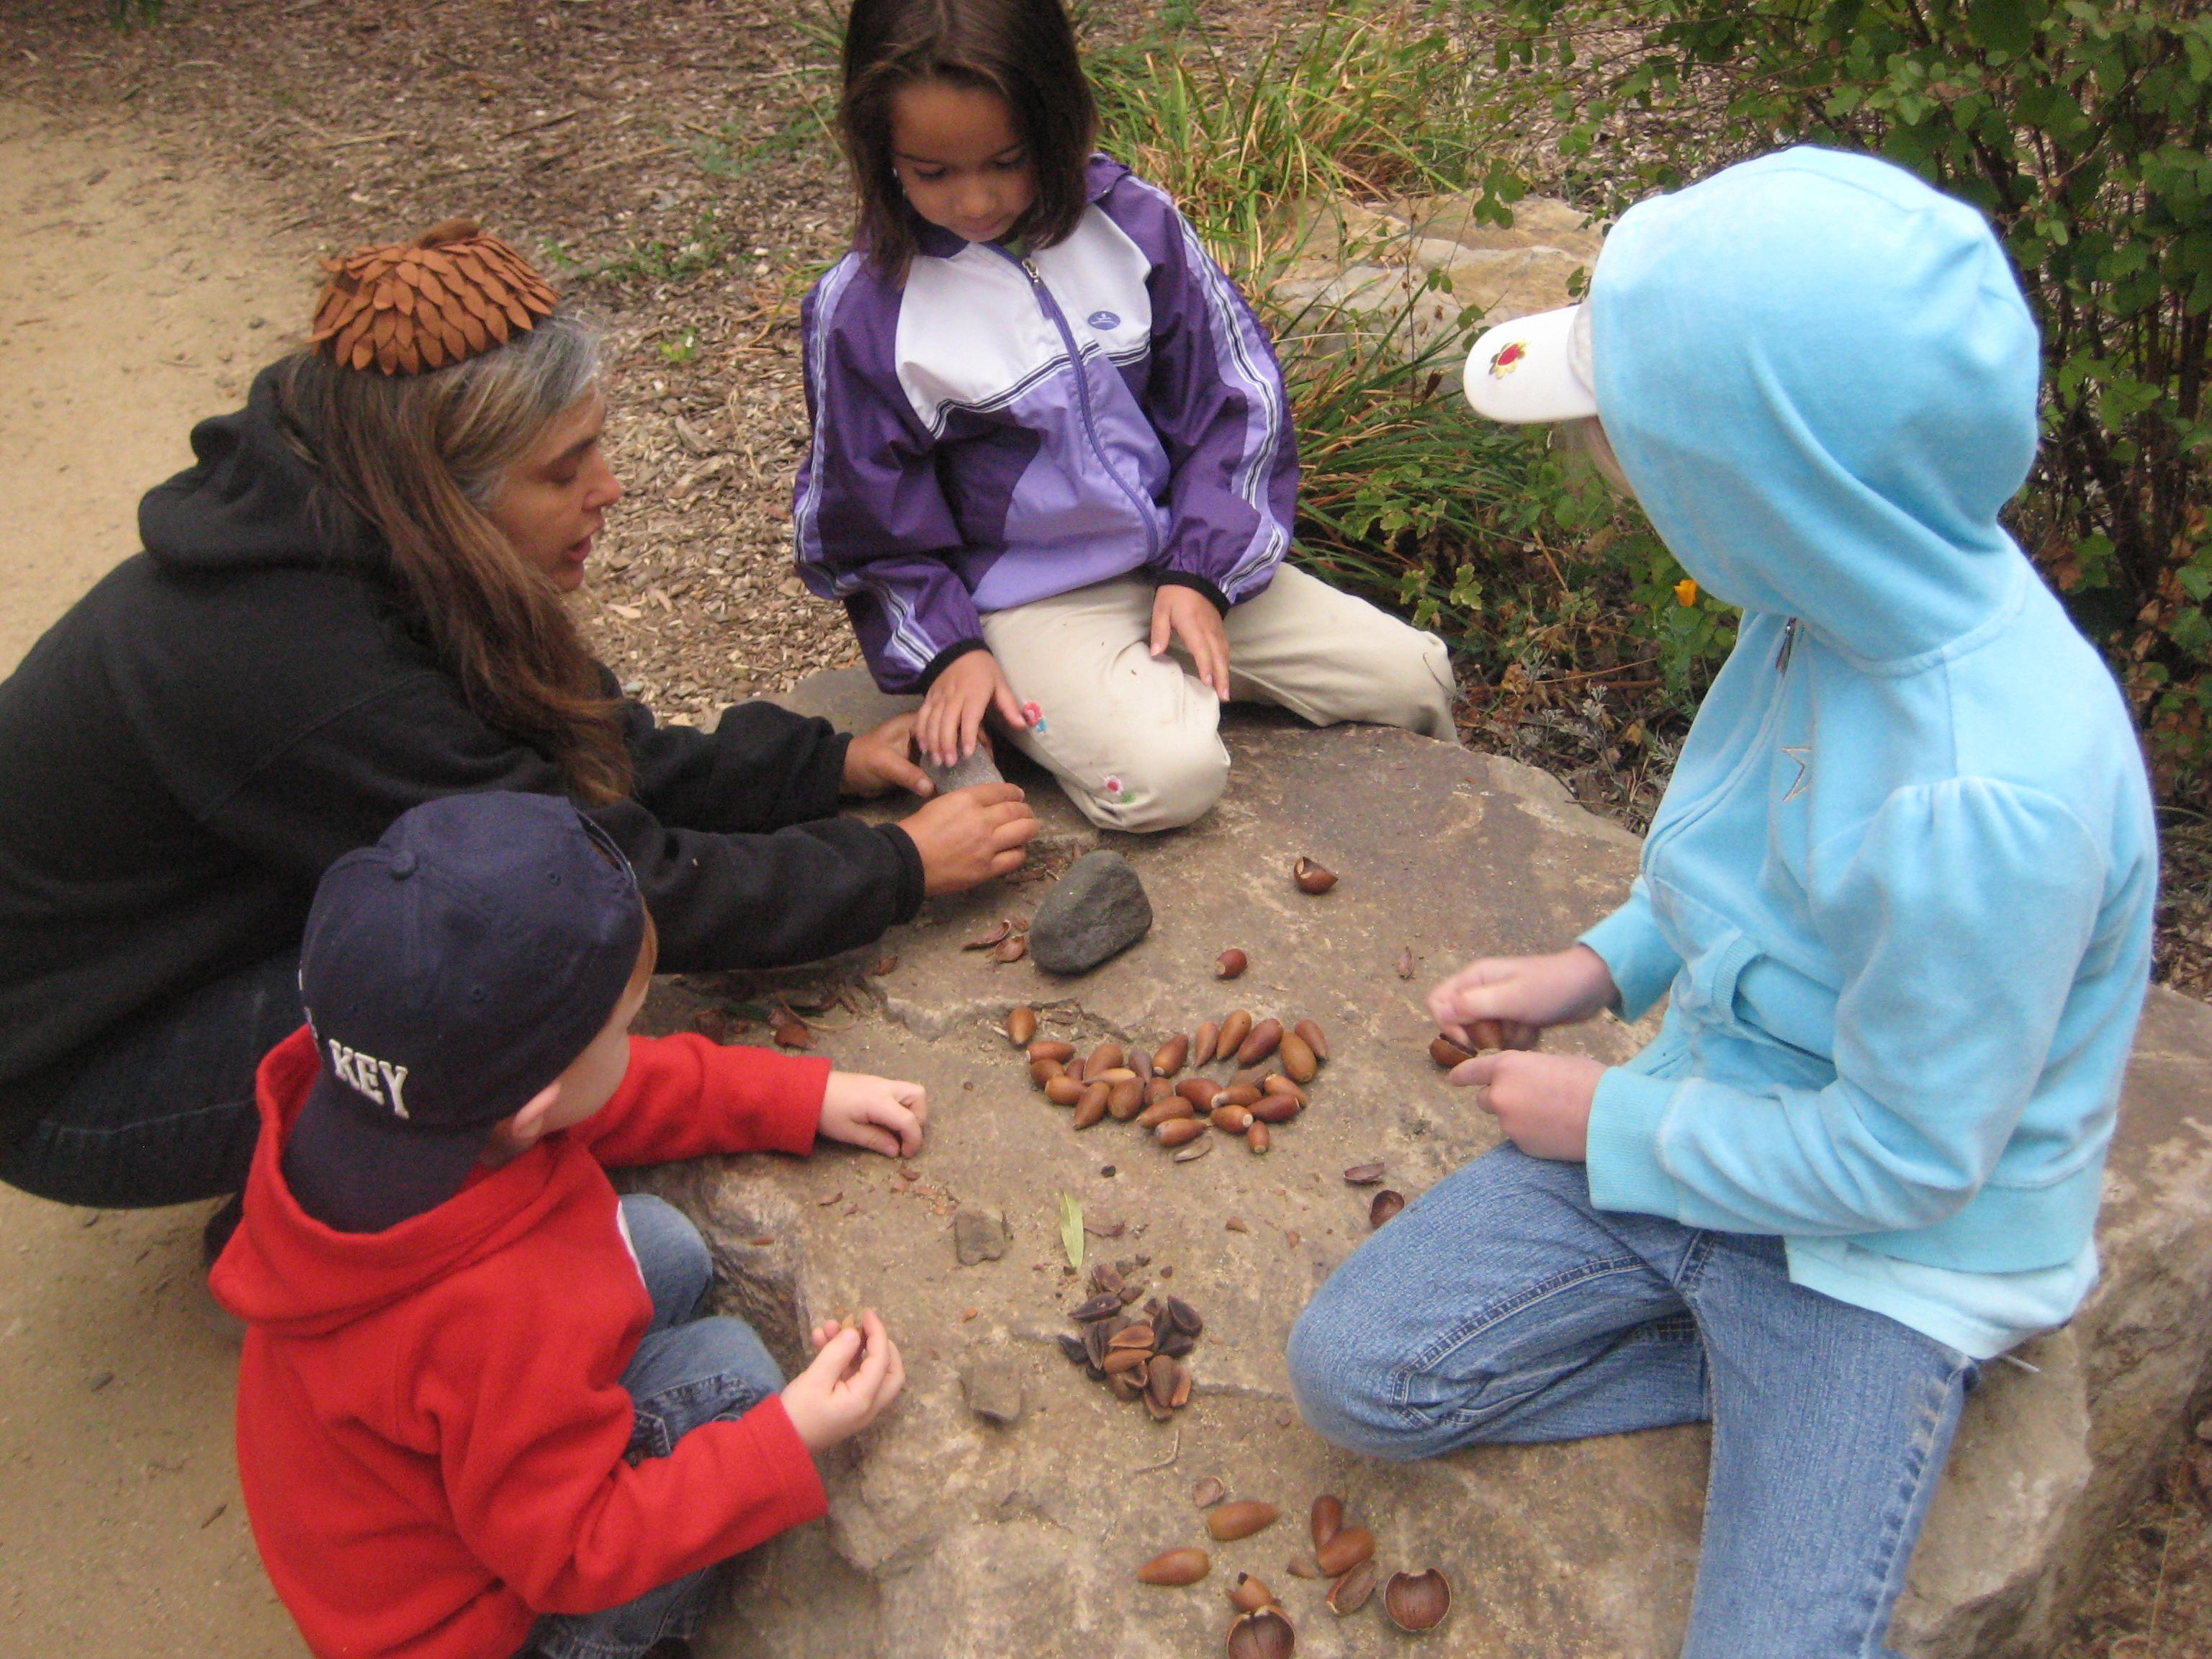 good acorn and kids pic